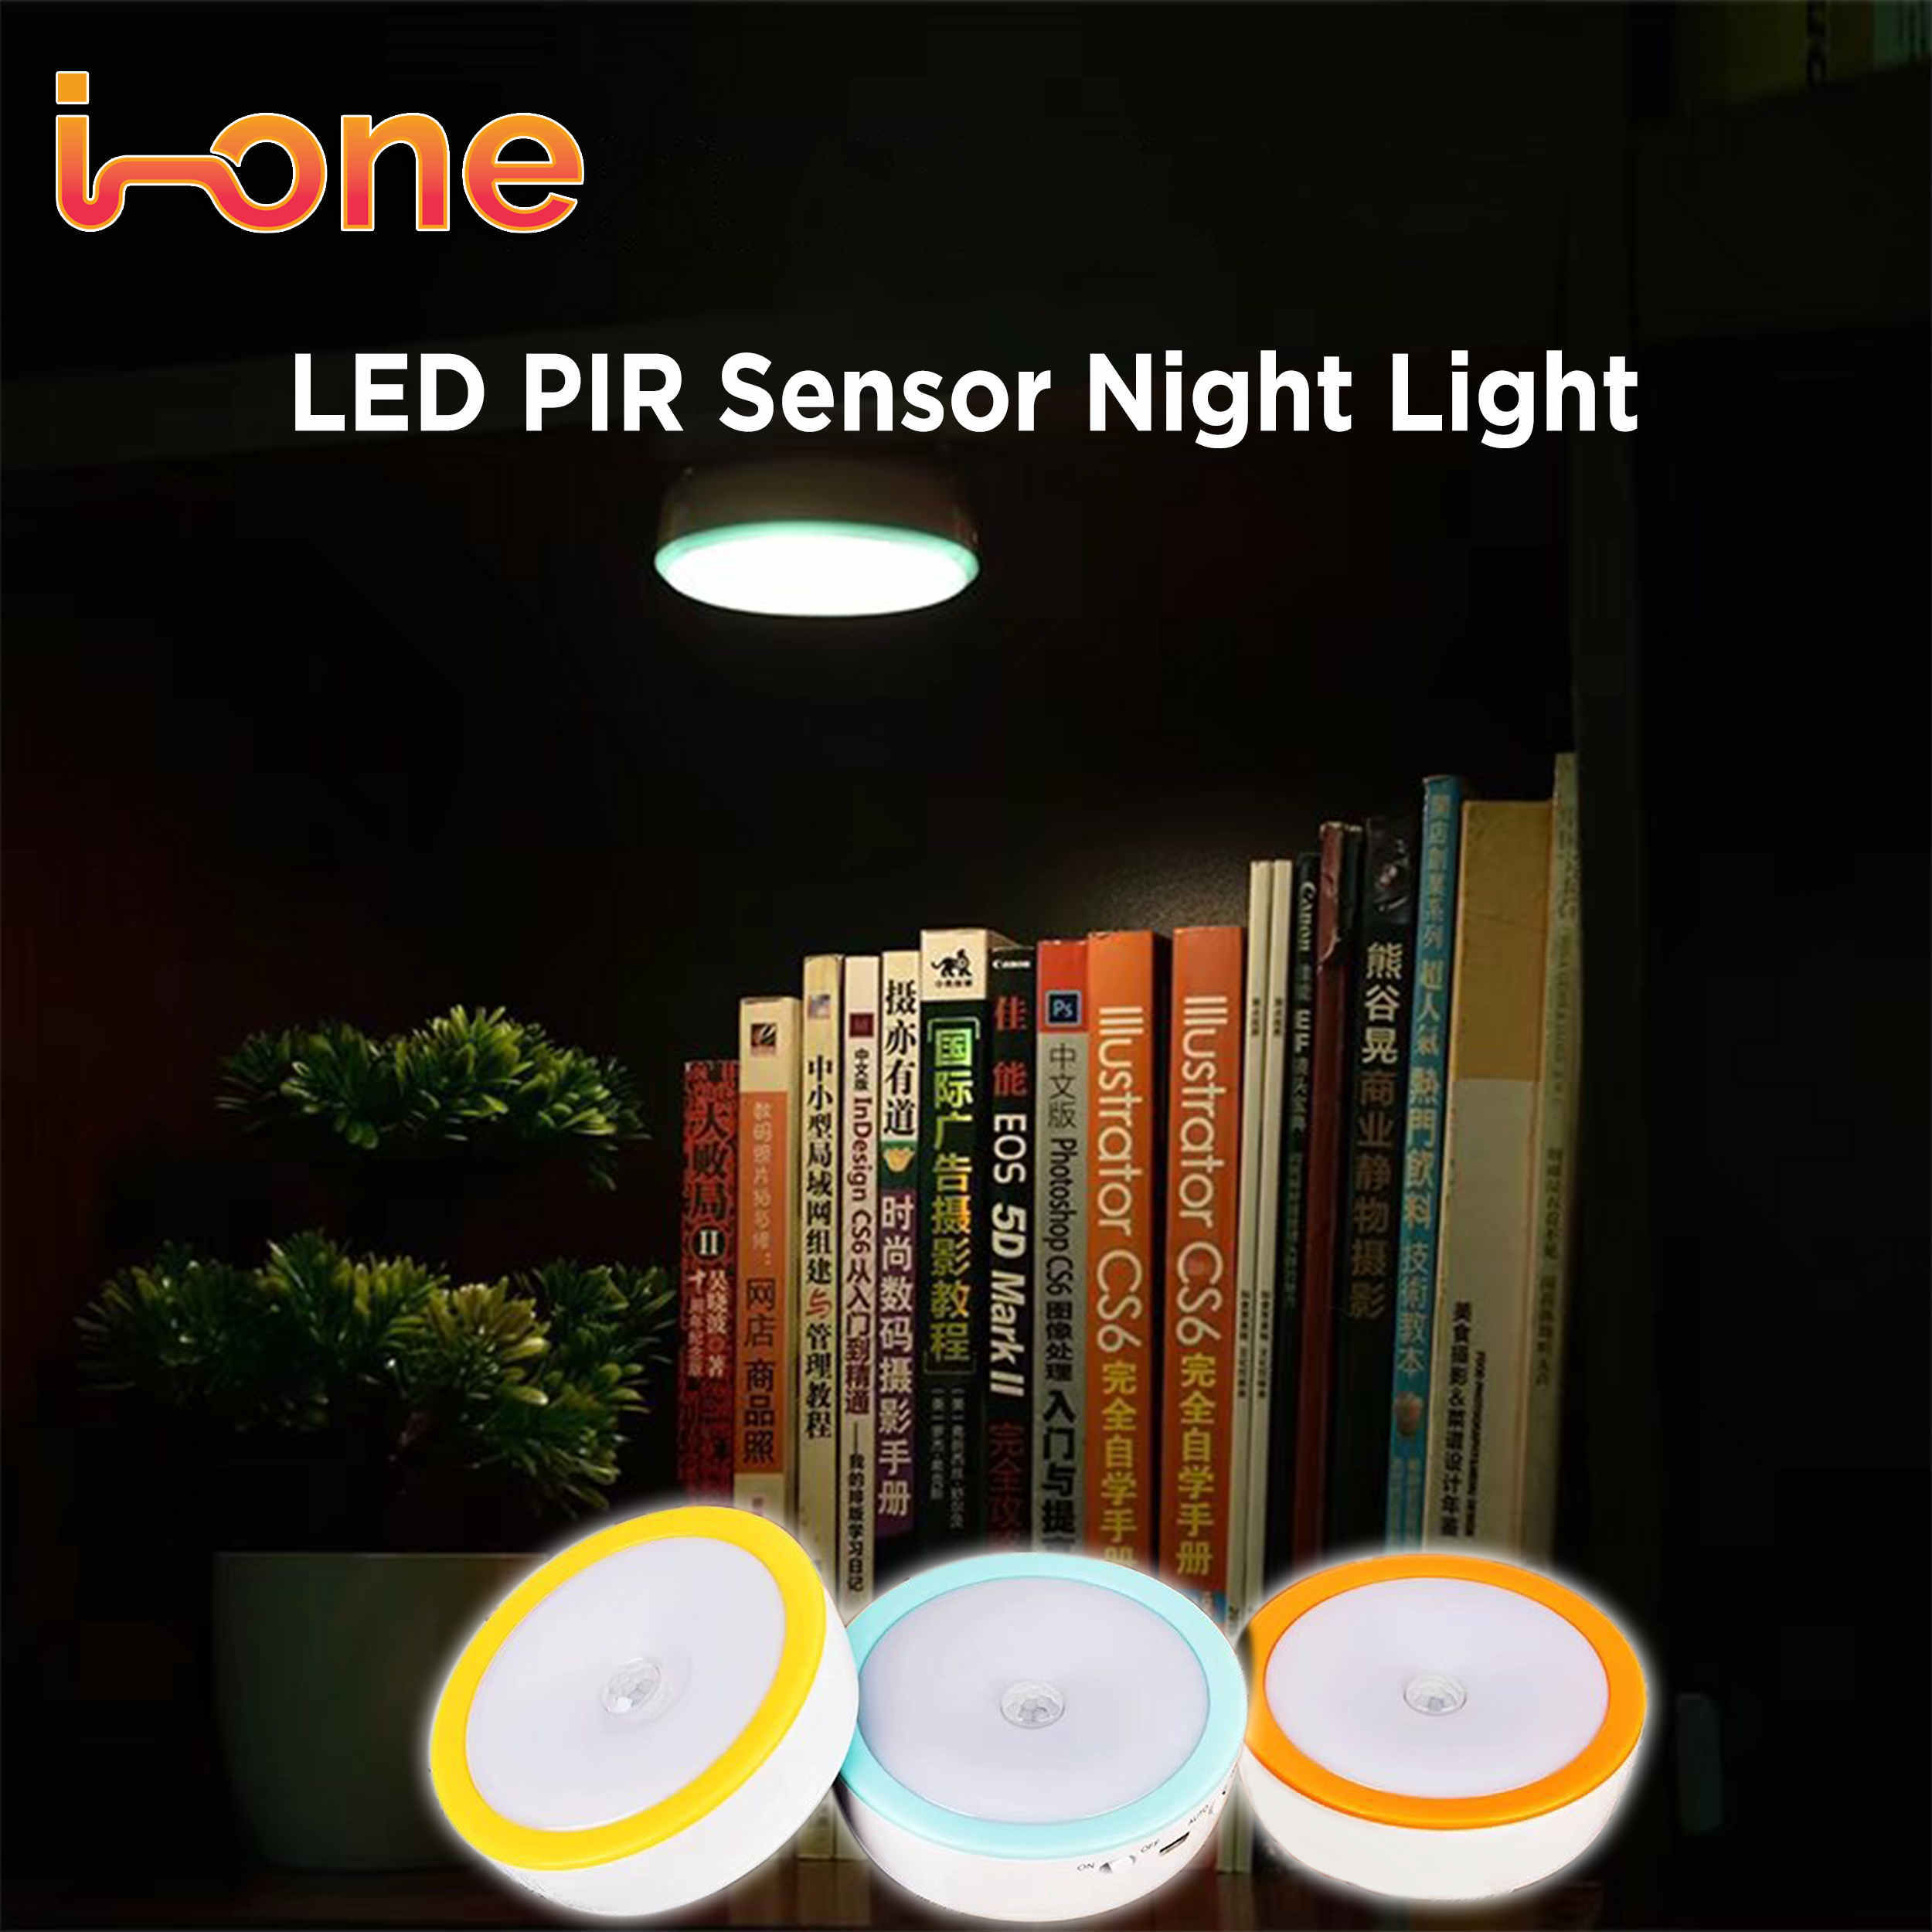 a1c79e86bf9b fit to viewer. prev next. Motion Sensor PIR Night Light ...